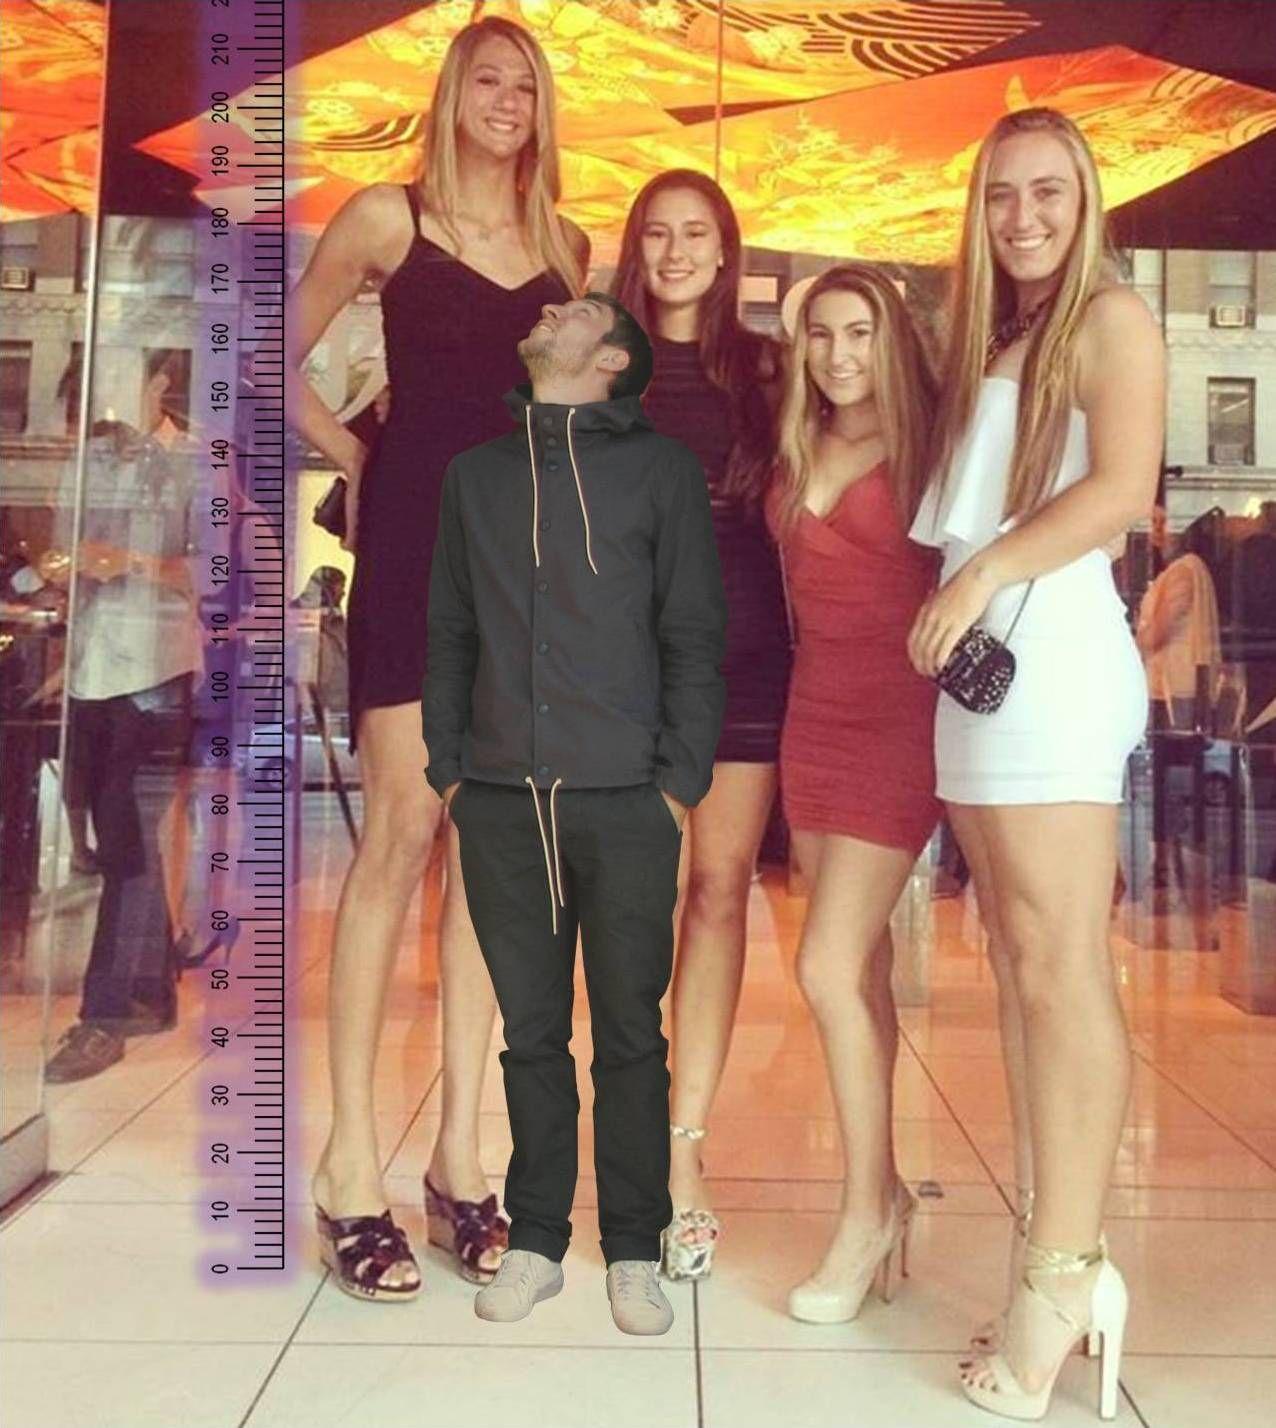 That Girl On Left Are 220 7 3 Ft Wanita Lucu